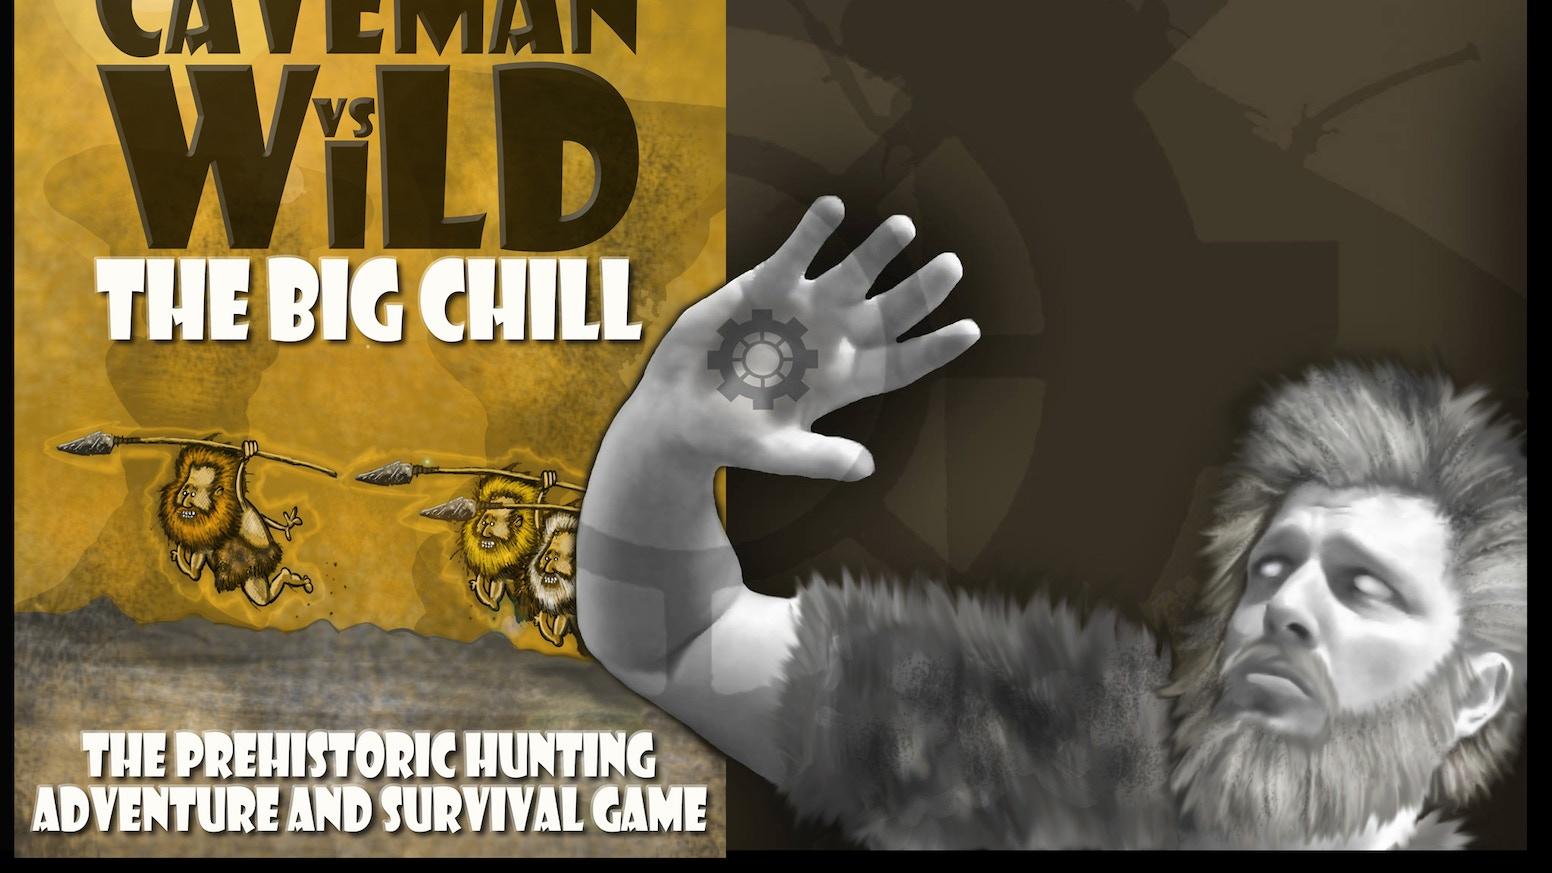 Caveman Questions : Flytrap factory presents 'caveman vs wild: the big chill' by anton